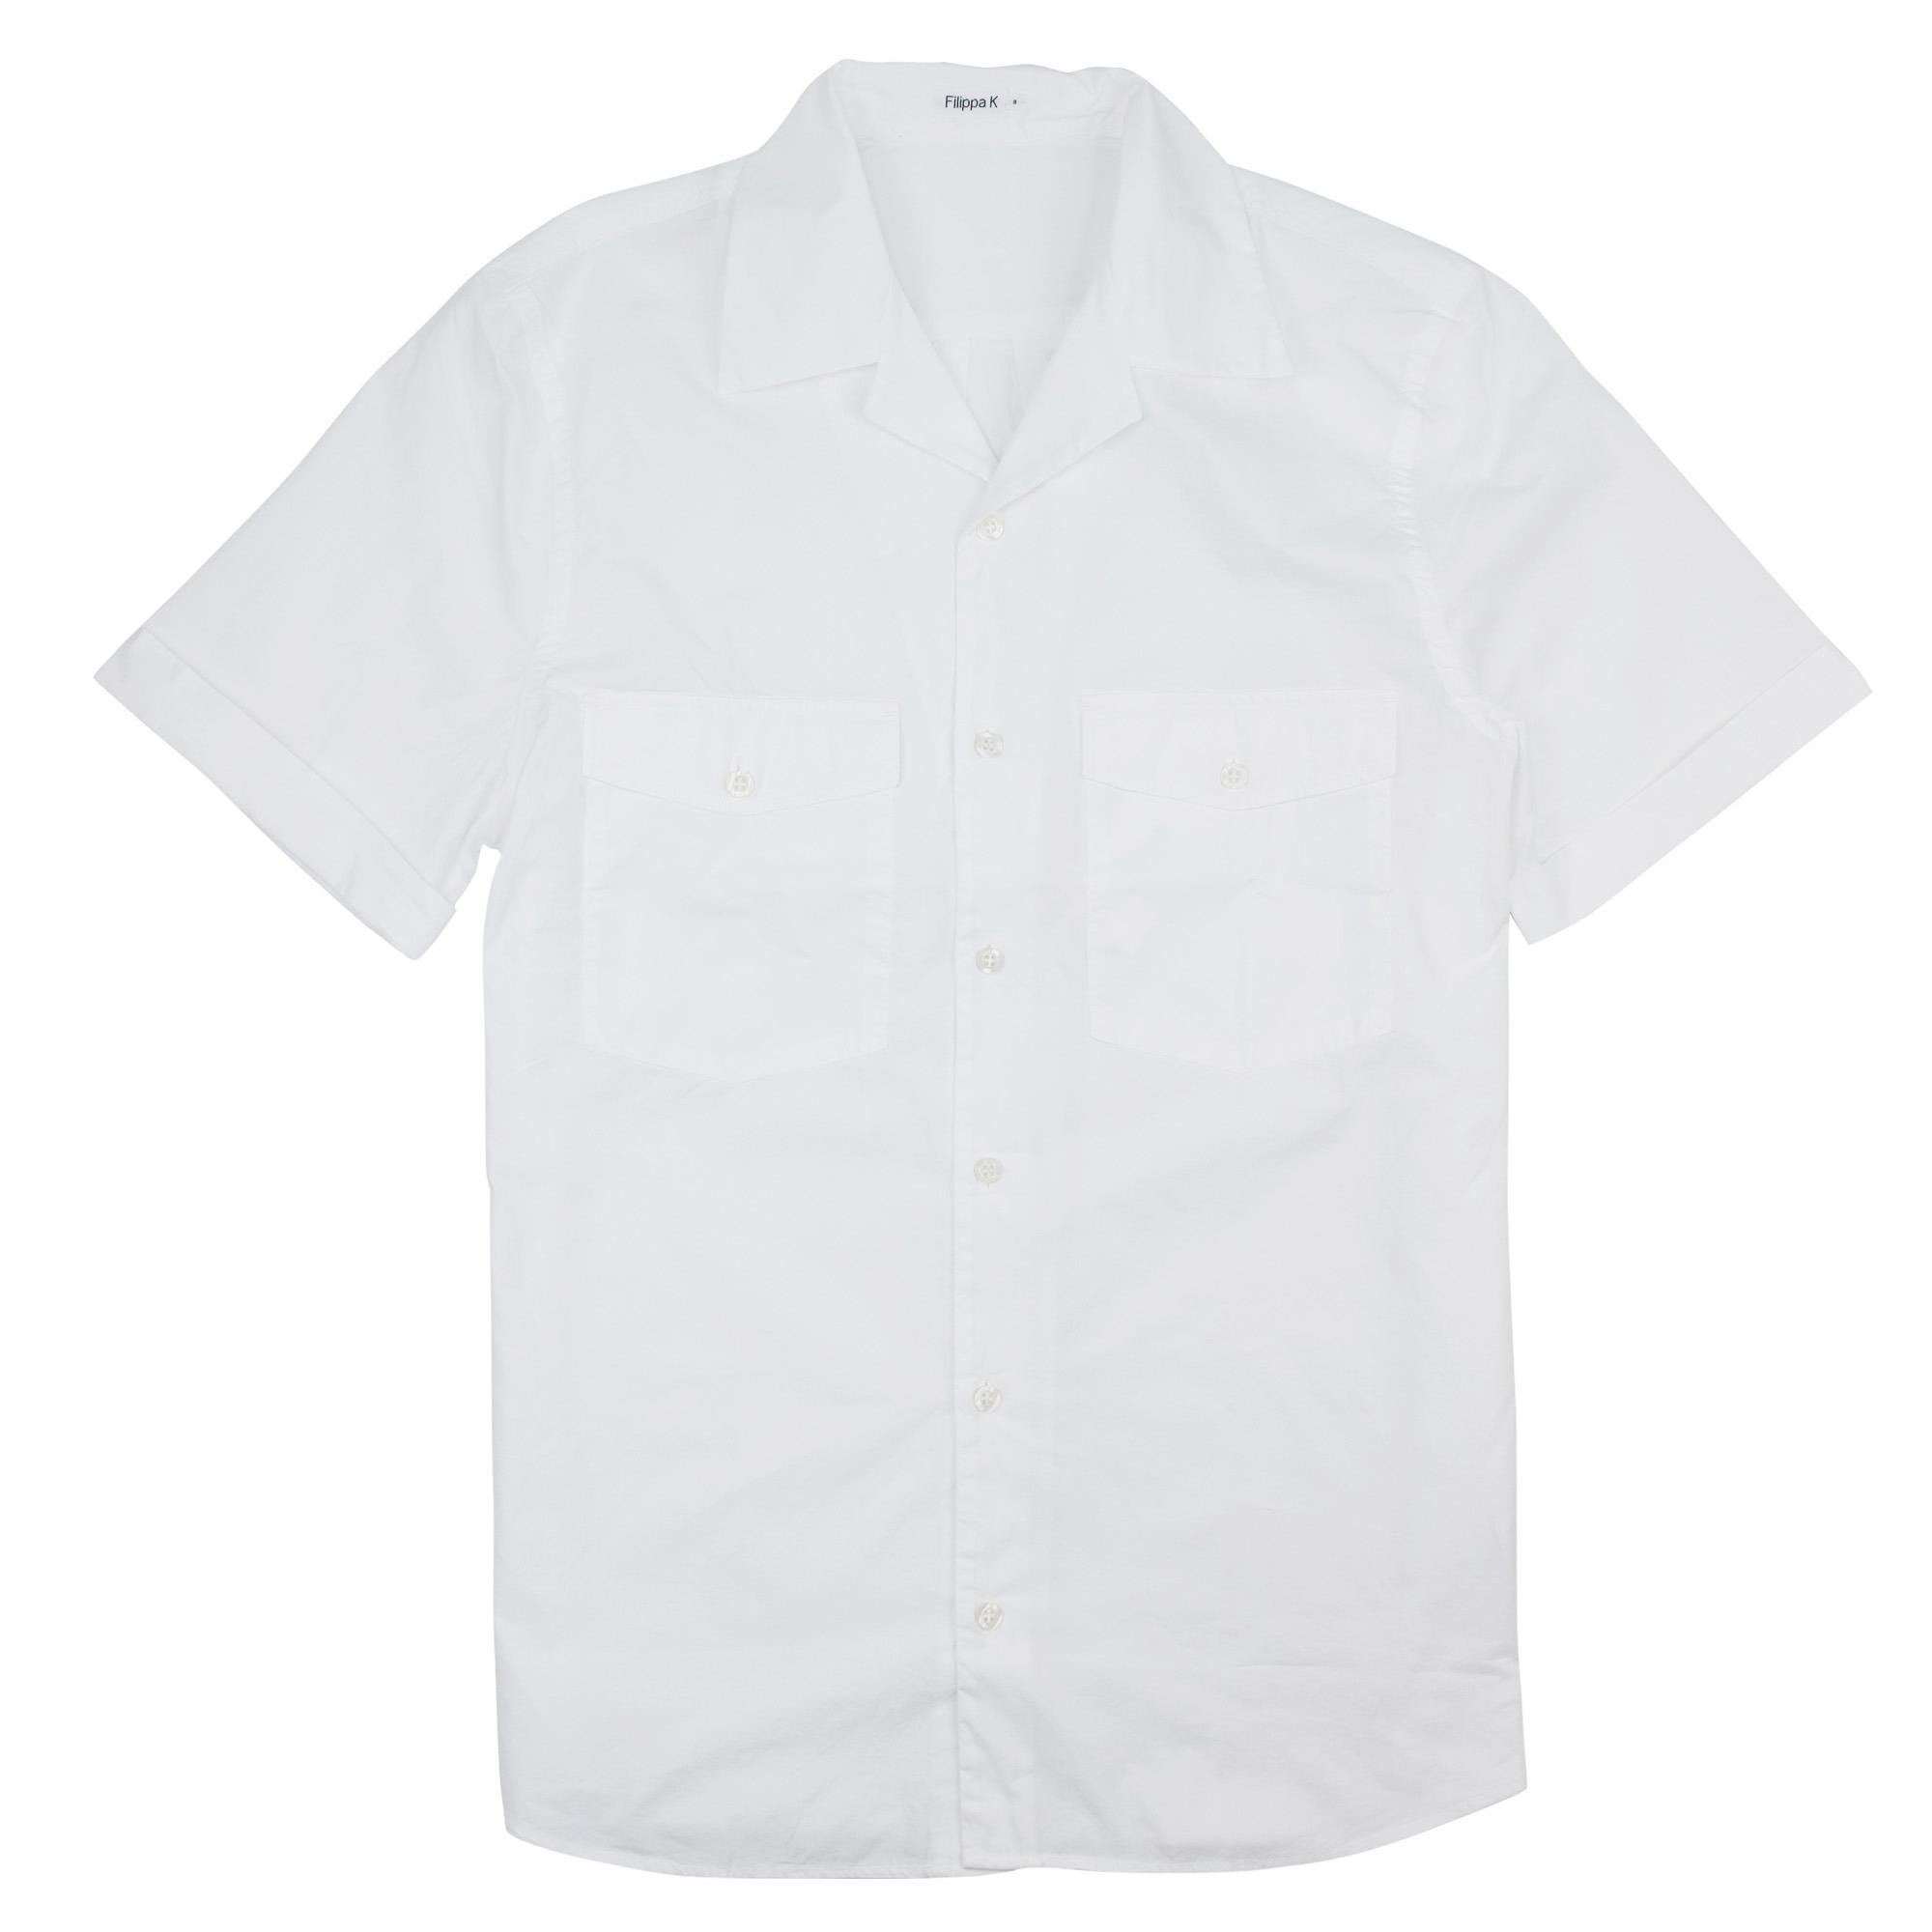 Don Washed Poplin Shirt White 1